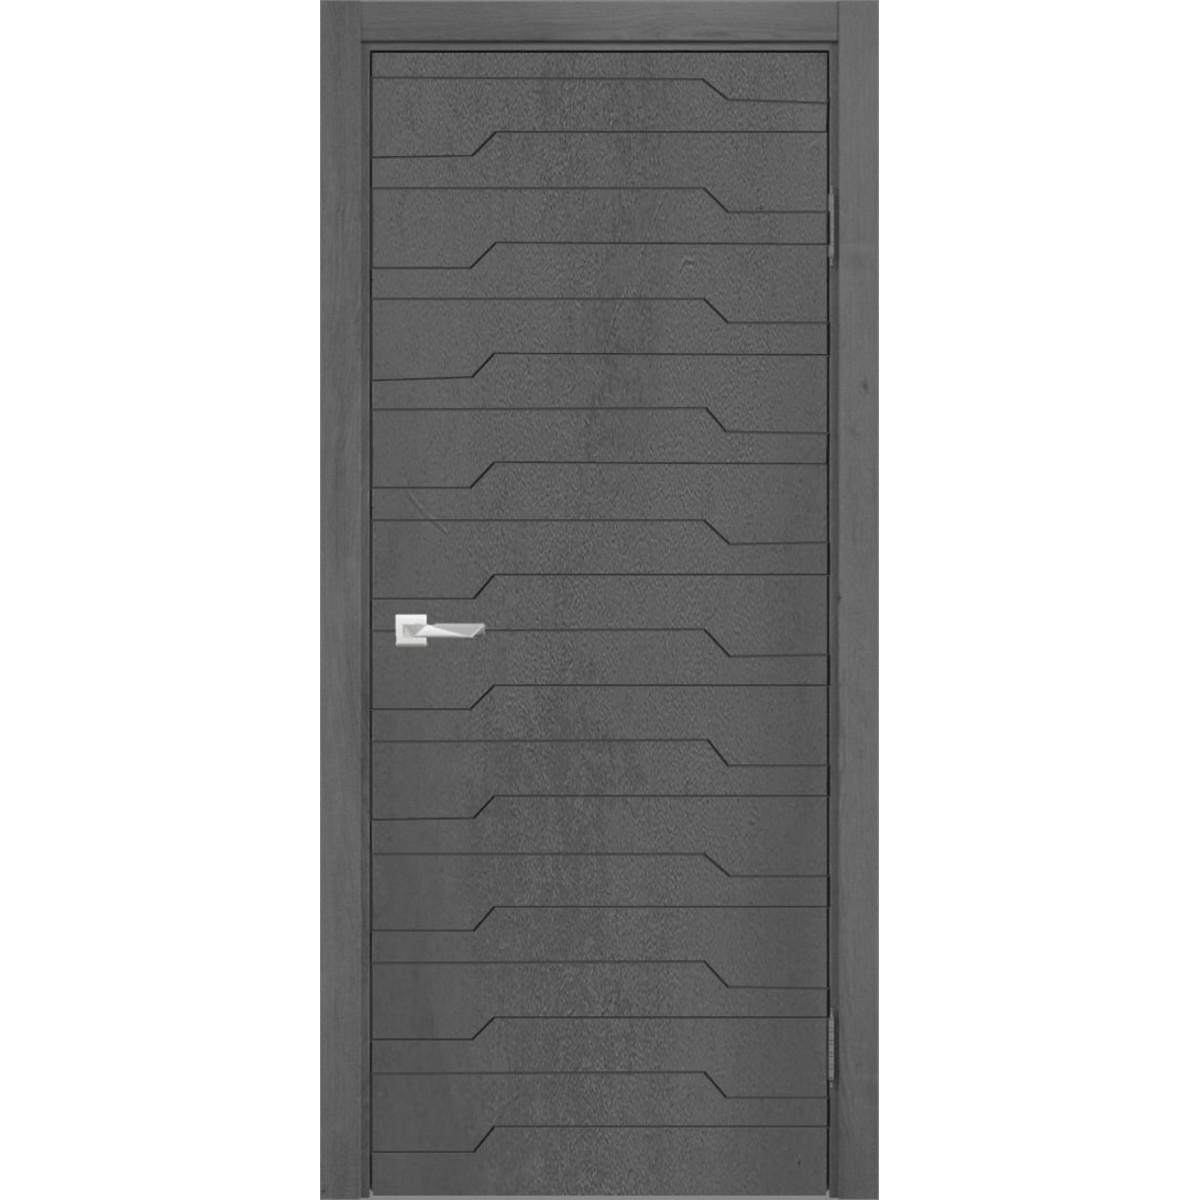 Дверное полотно Loyard Севилья МП_0390 2000х800х44 мм МДФ